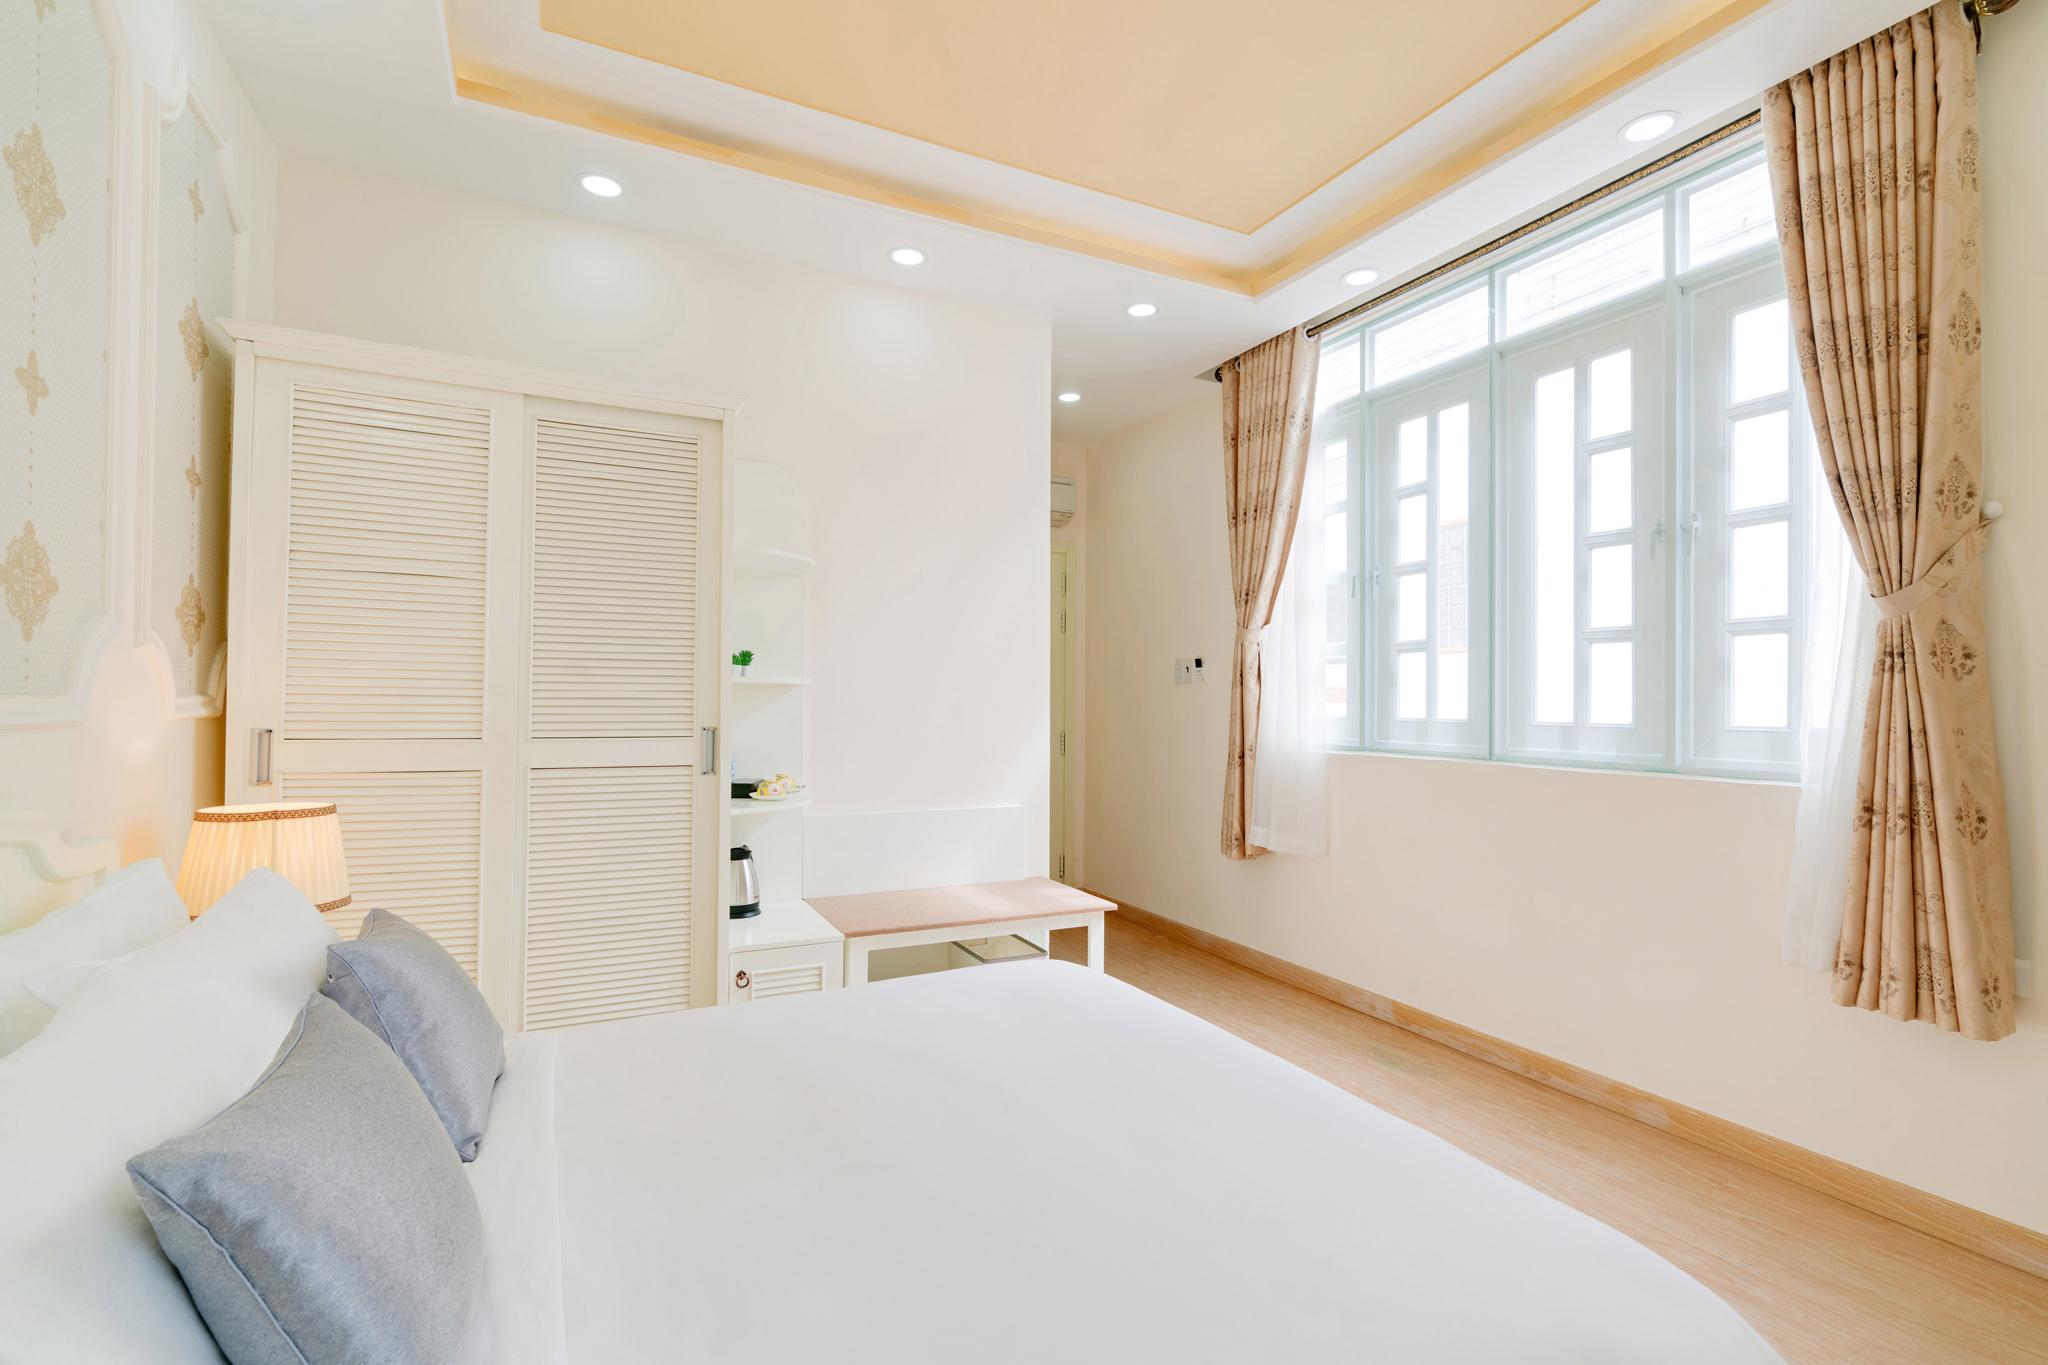 20180529 - Chez Mimosa - Interior - Hotel - 005.jpg